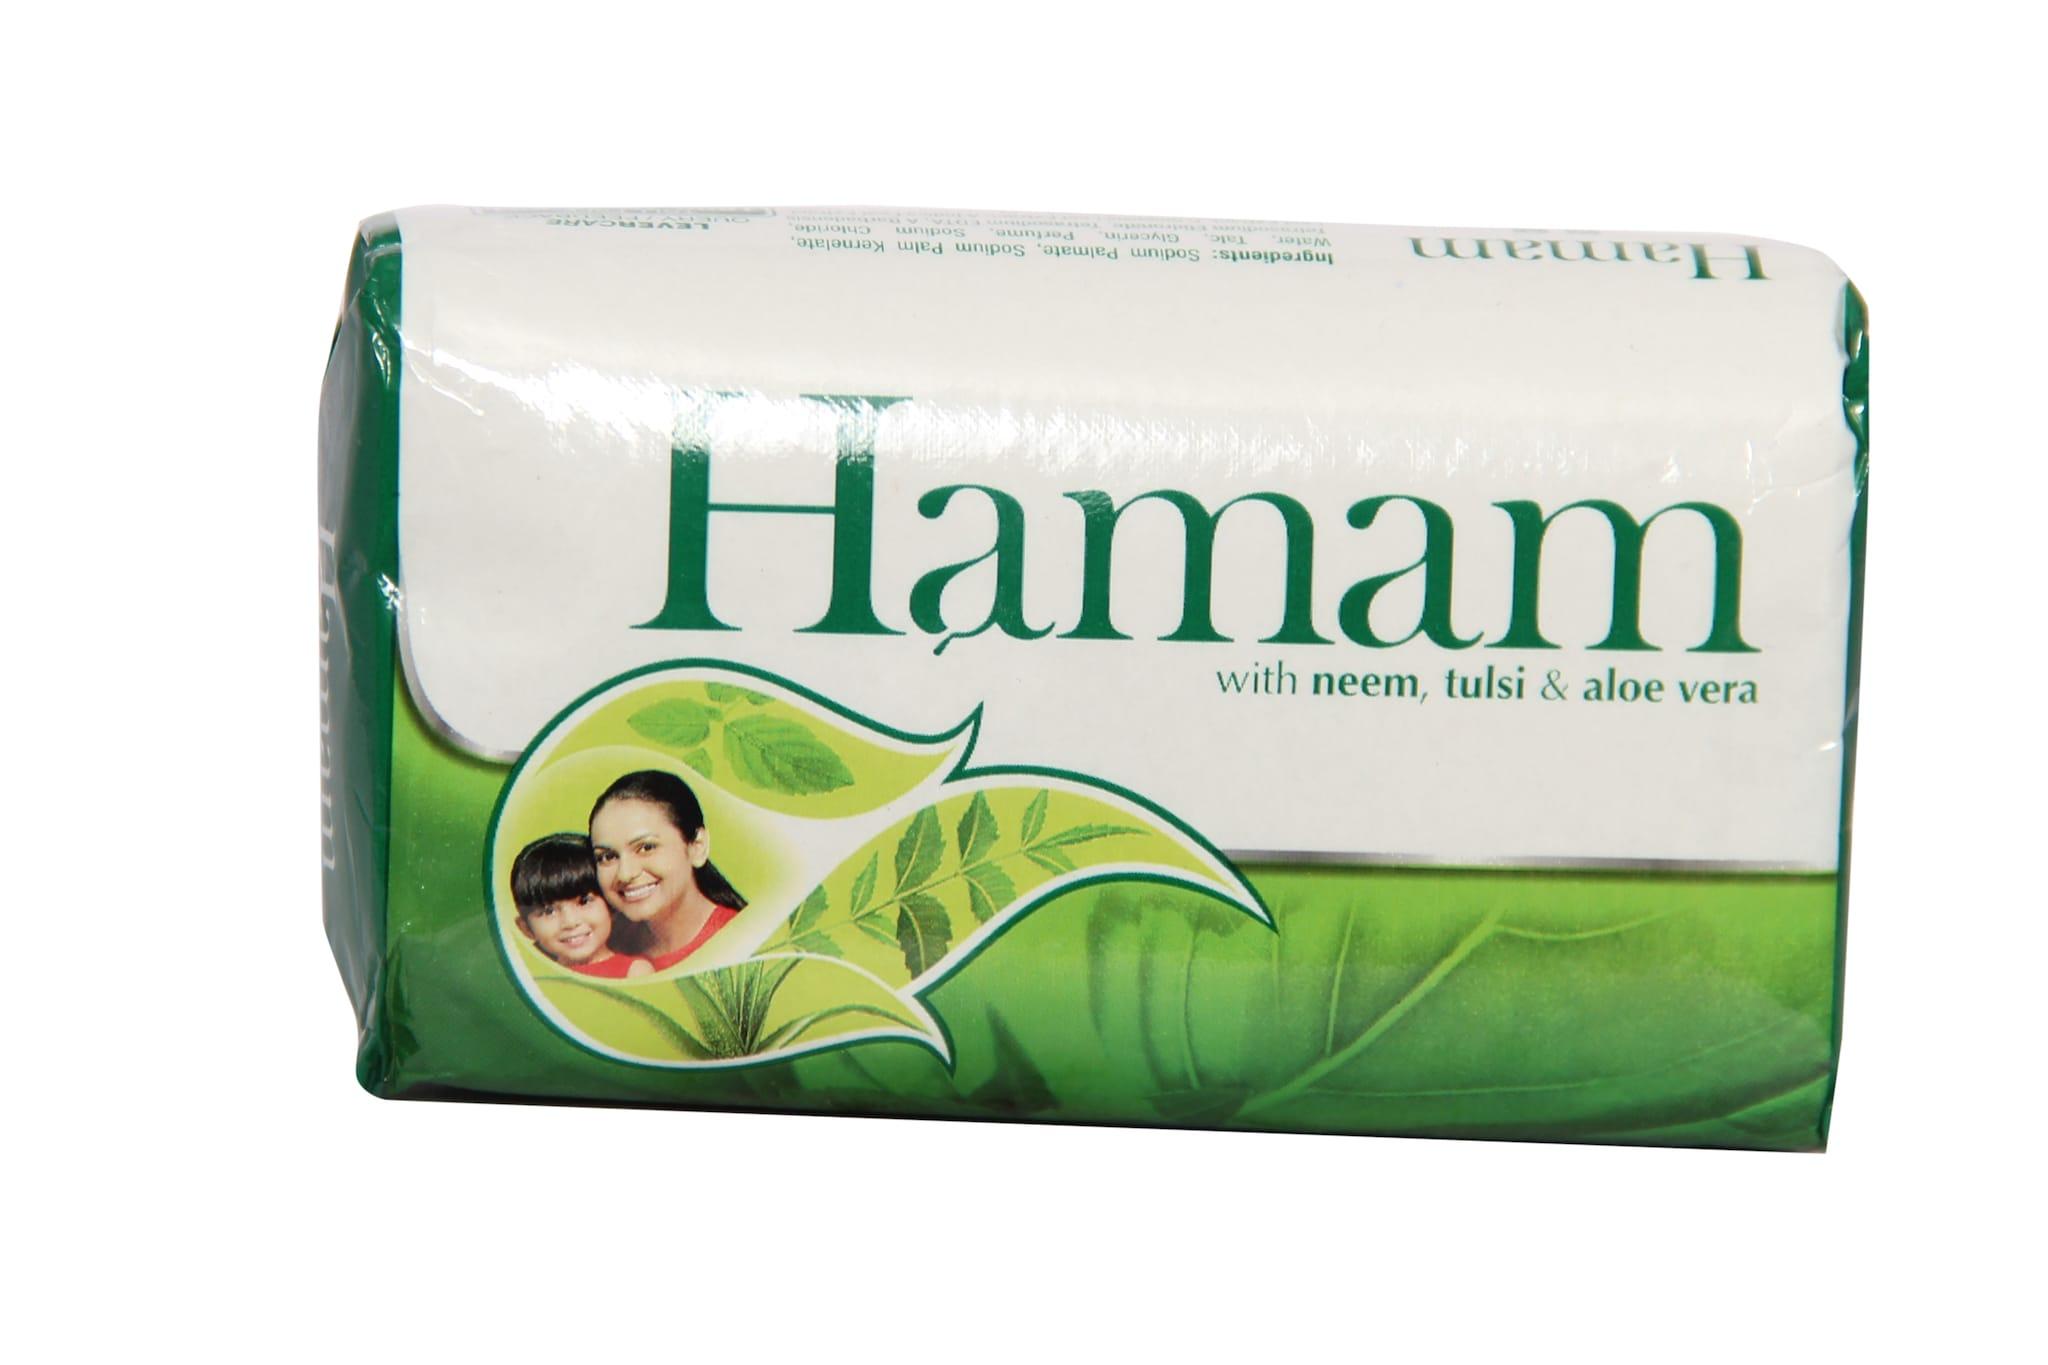 Hamam Bath Soap With Neem, Tulsi & Aloe Vera